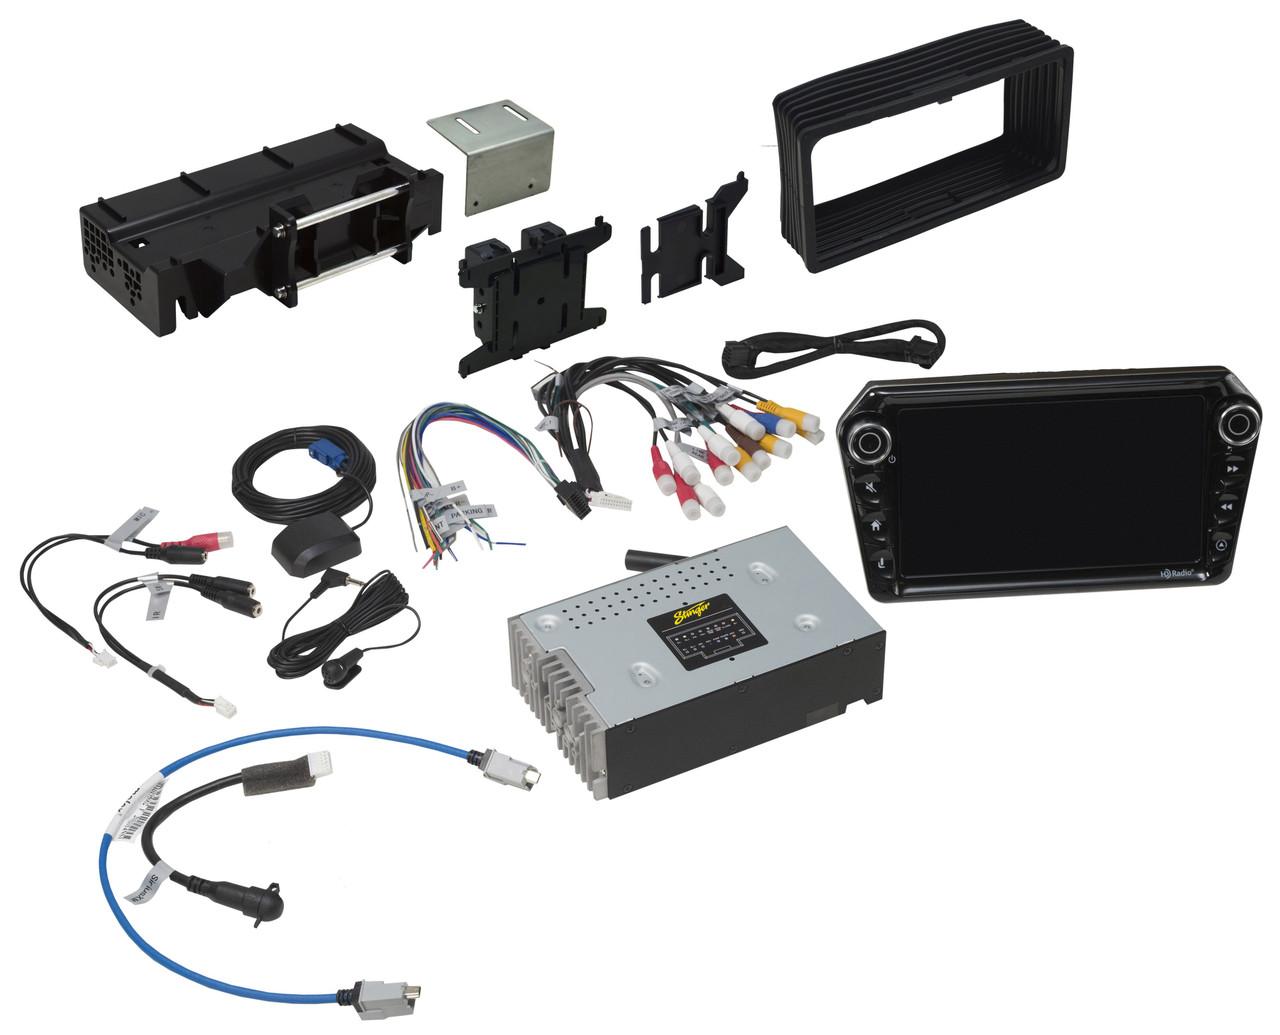 touch audio wiring stinger elev8 un1880 am fm audio video receiver w 8 inch touch  stinger elev8 un1880 am fm audio video